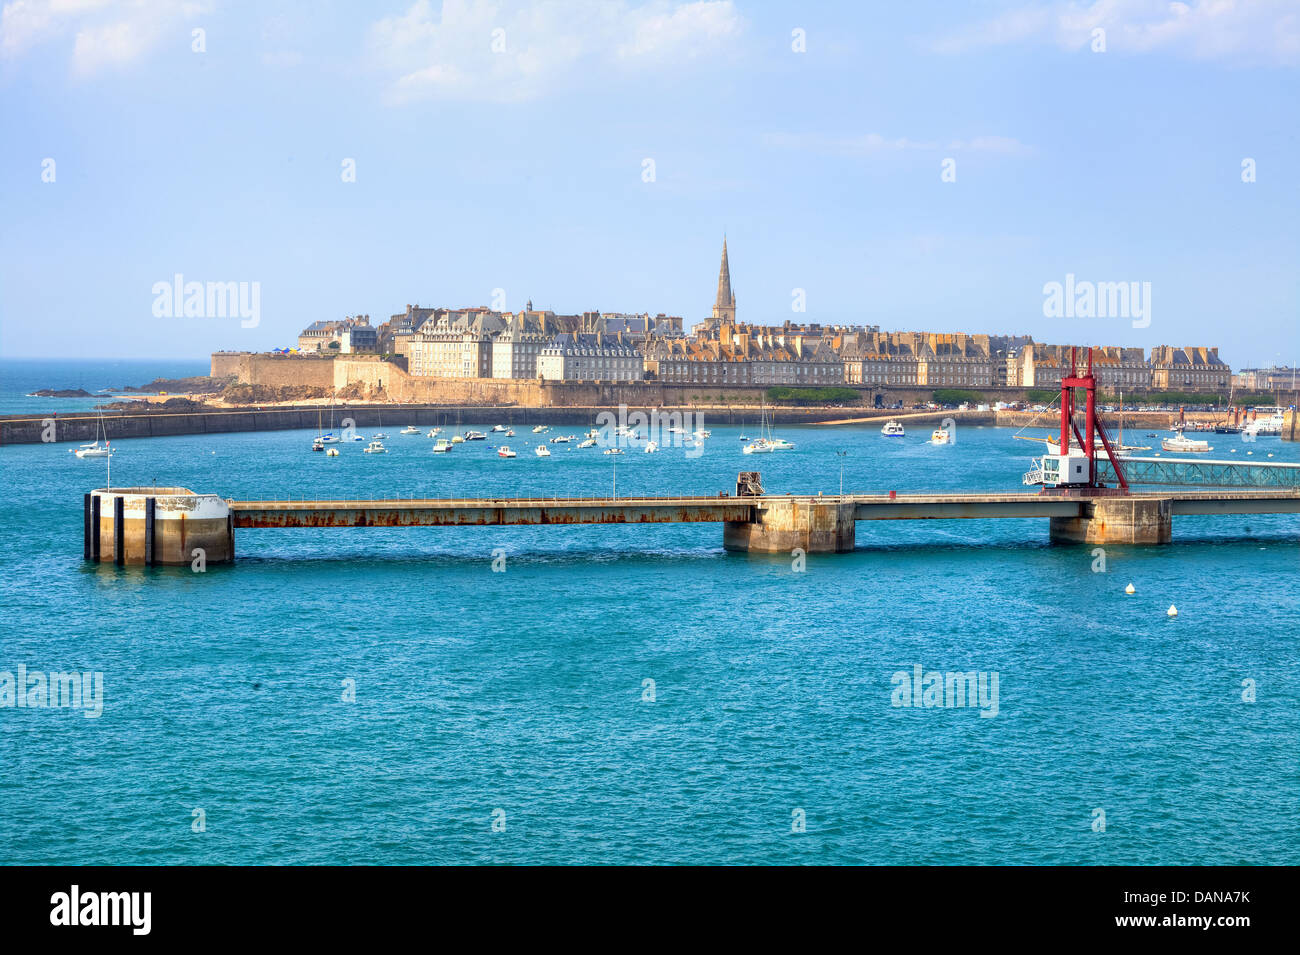 Saint-Malo, Brittany, France - Stock Image